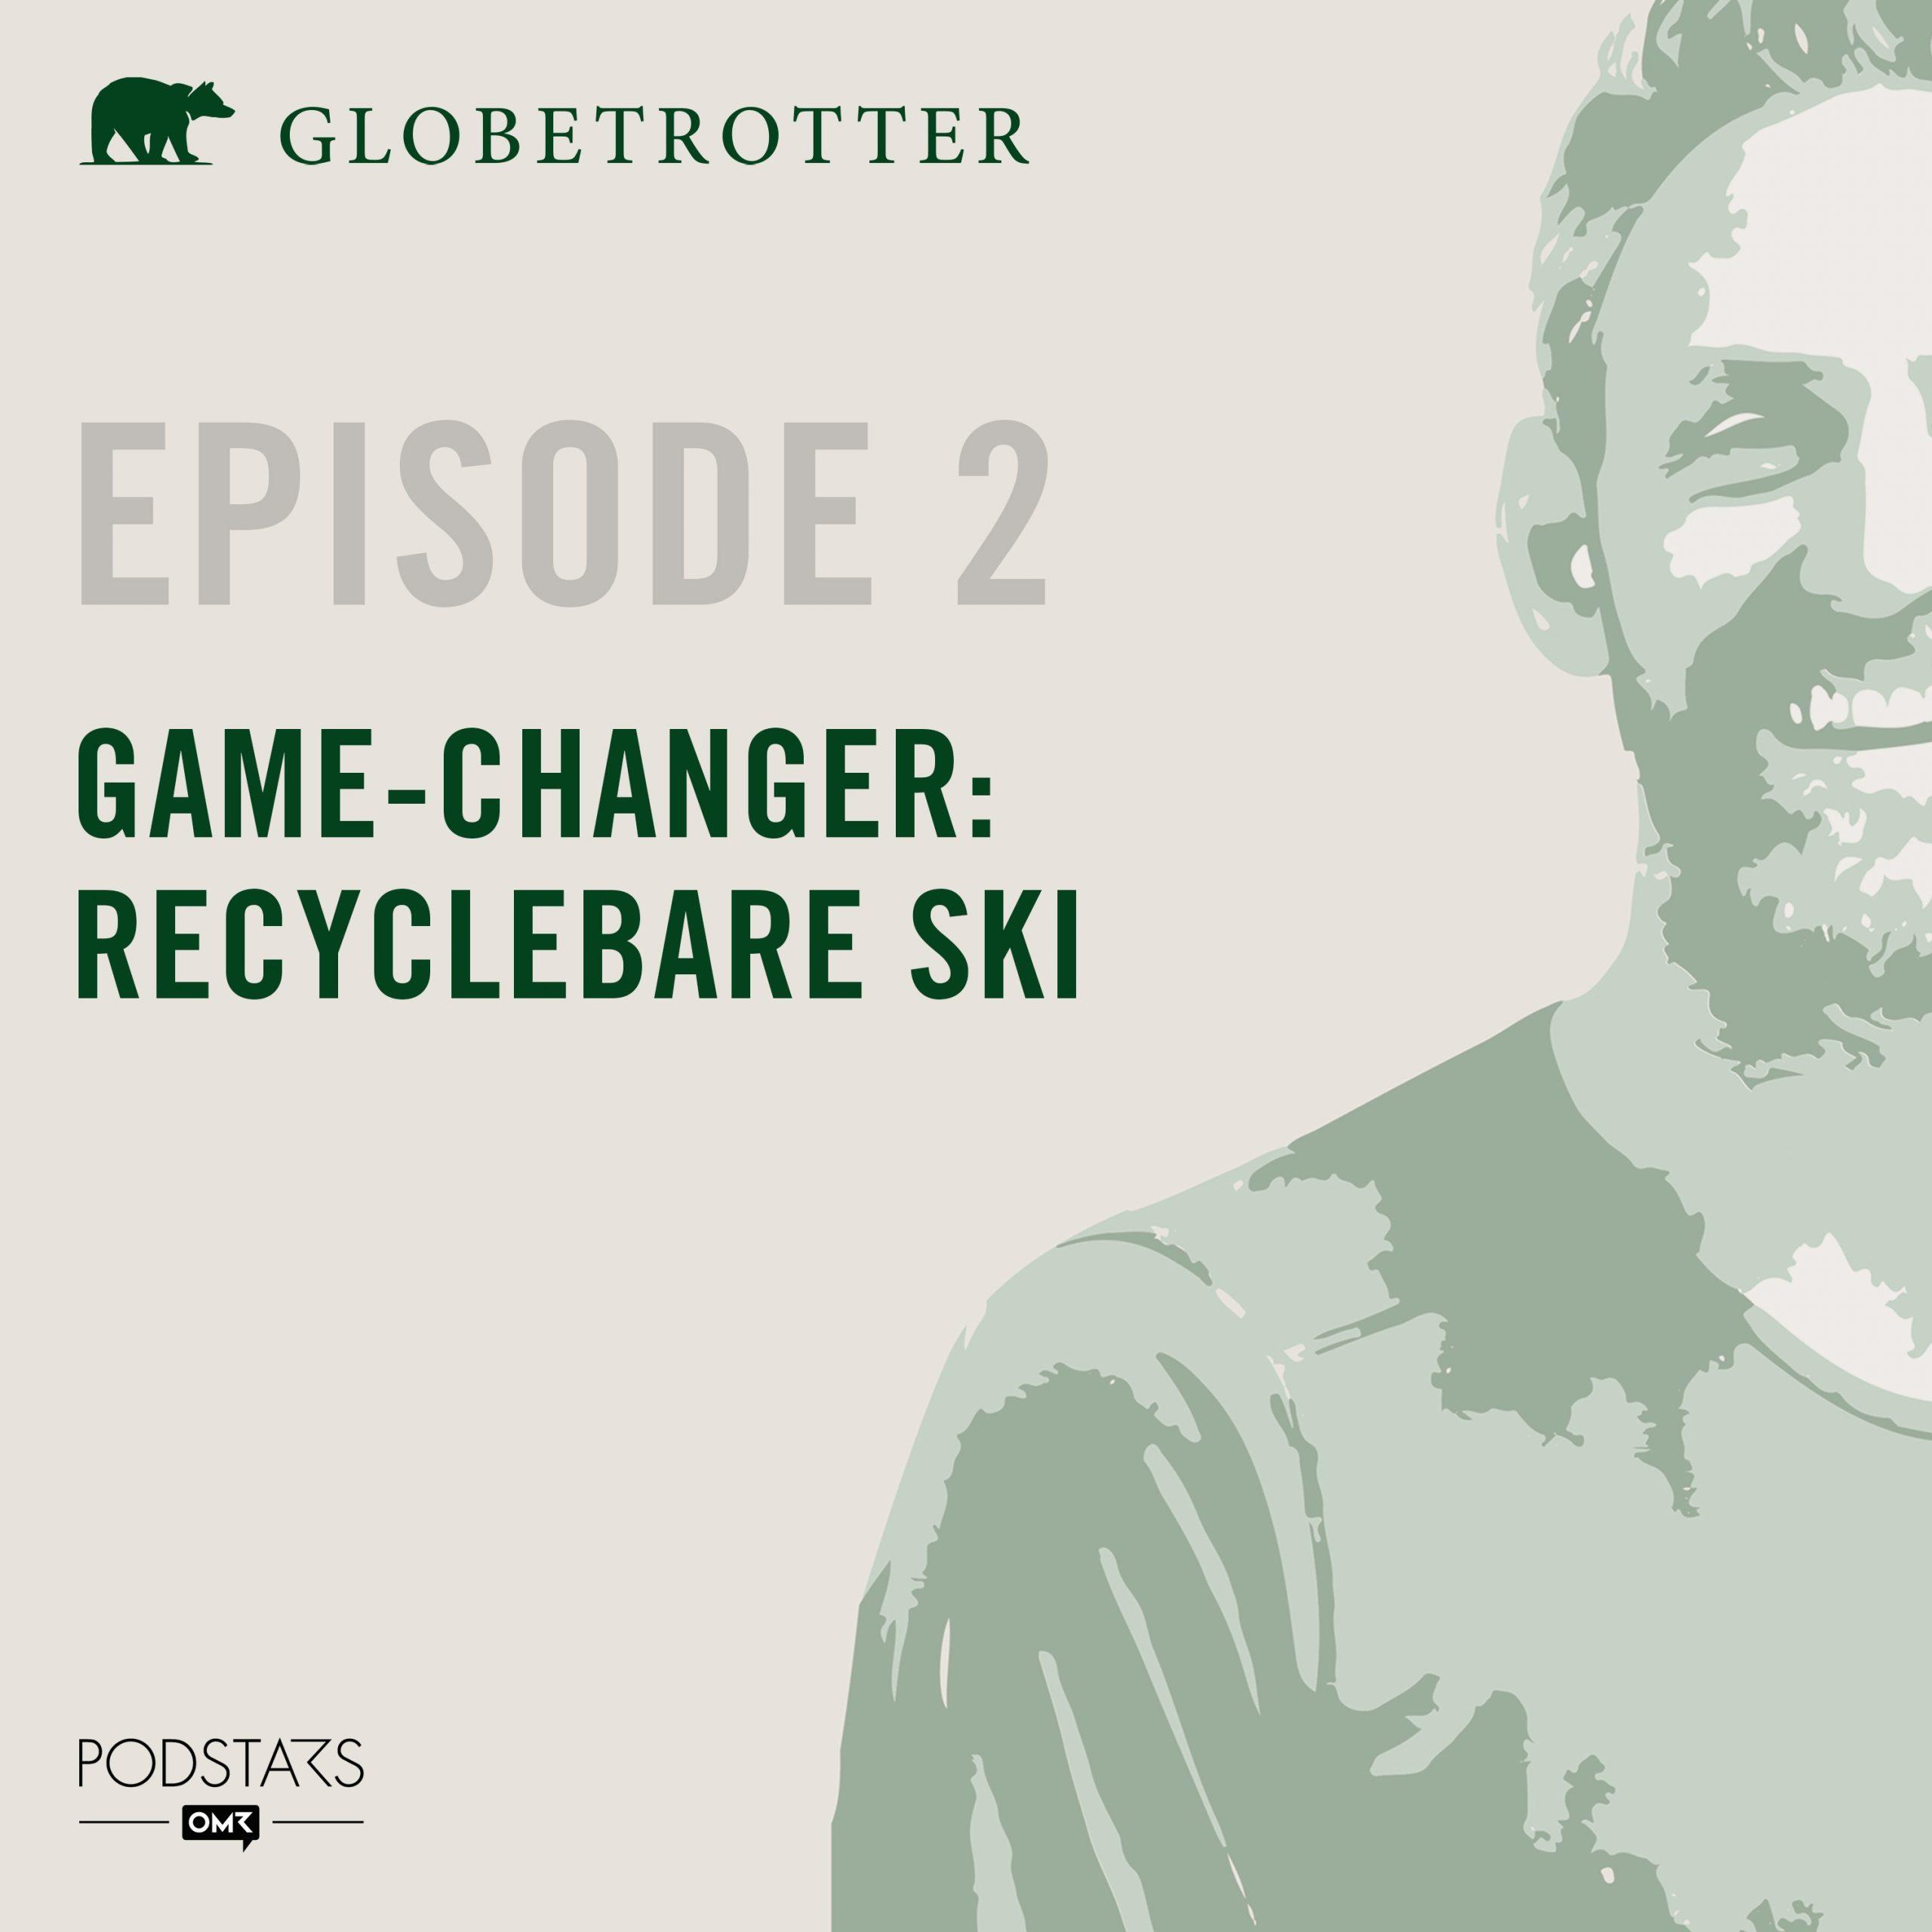 Cover-Neue-Horizonte-Episode-02-Game-Changer-recyclebare-ski